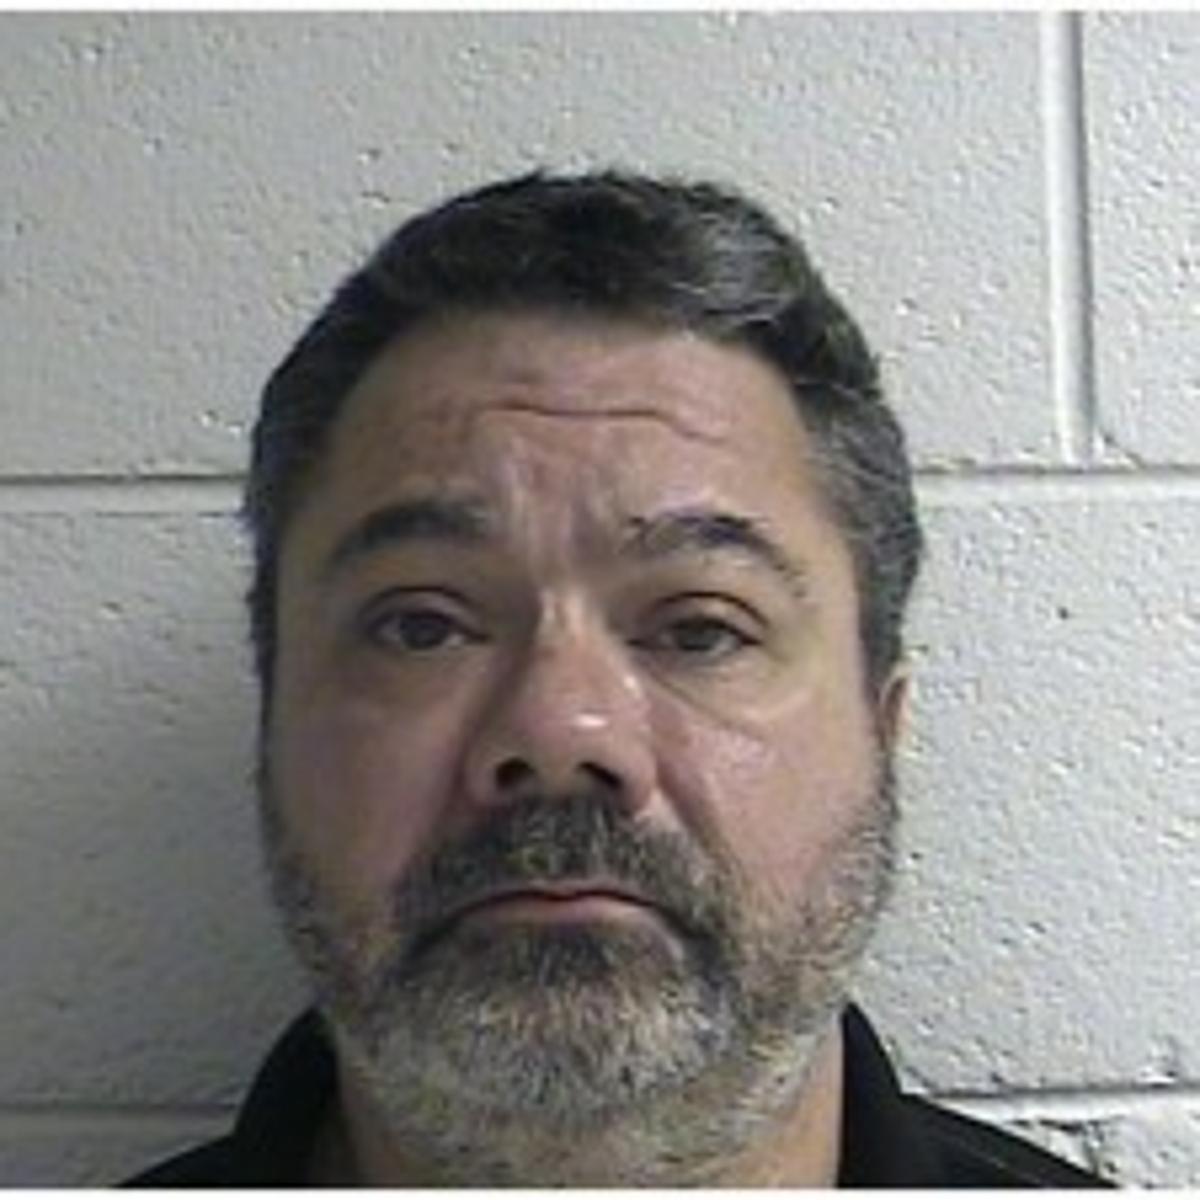 Washington County, Tenn  man turns himself in after sexual